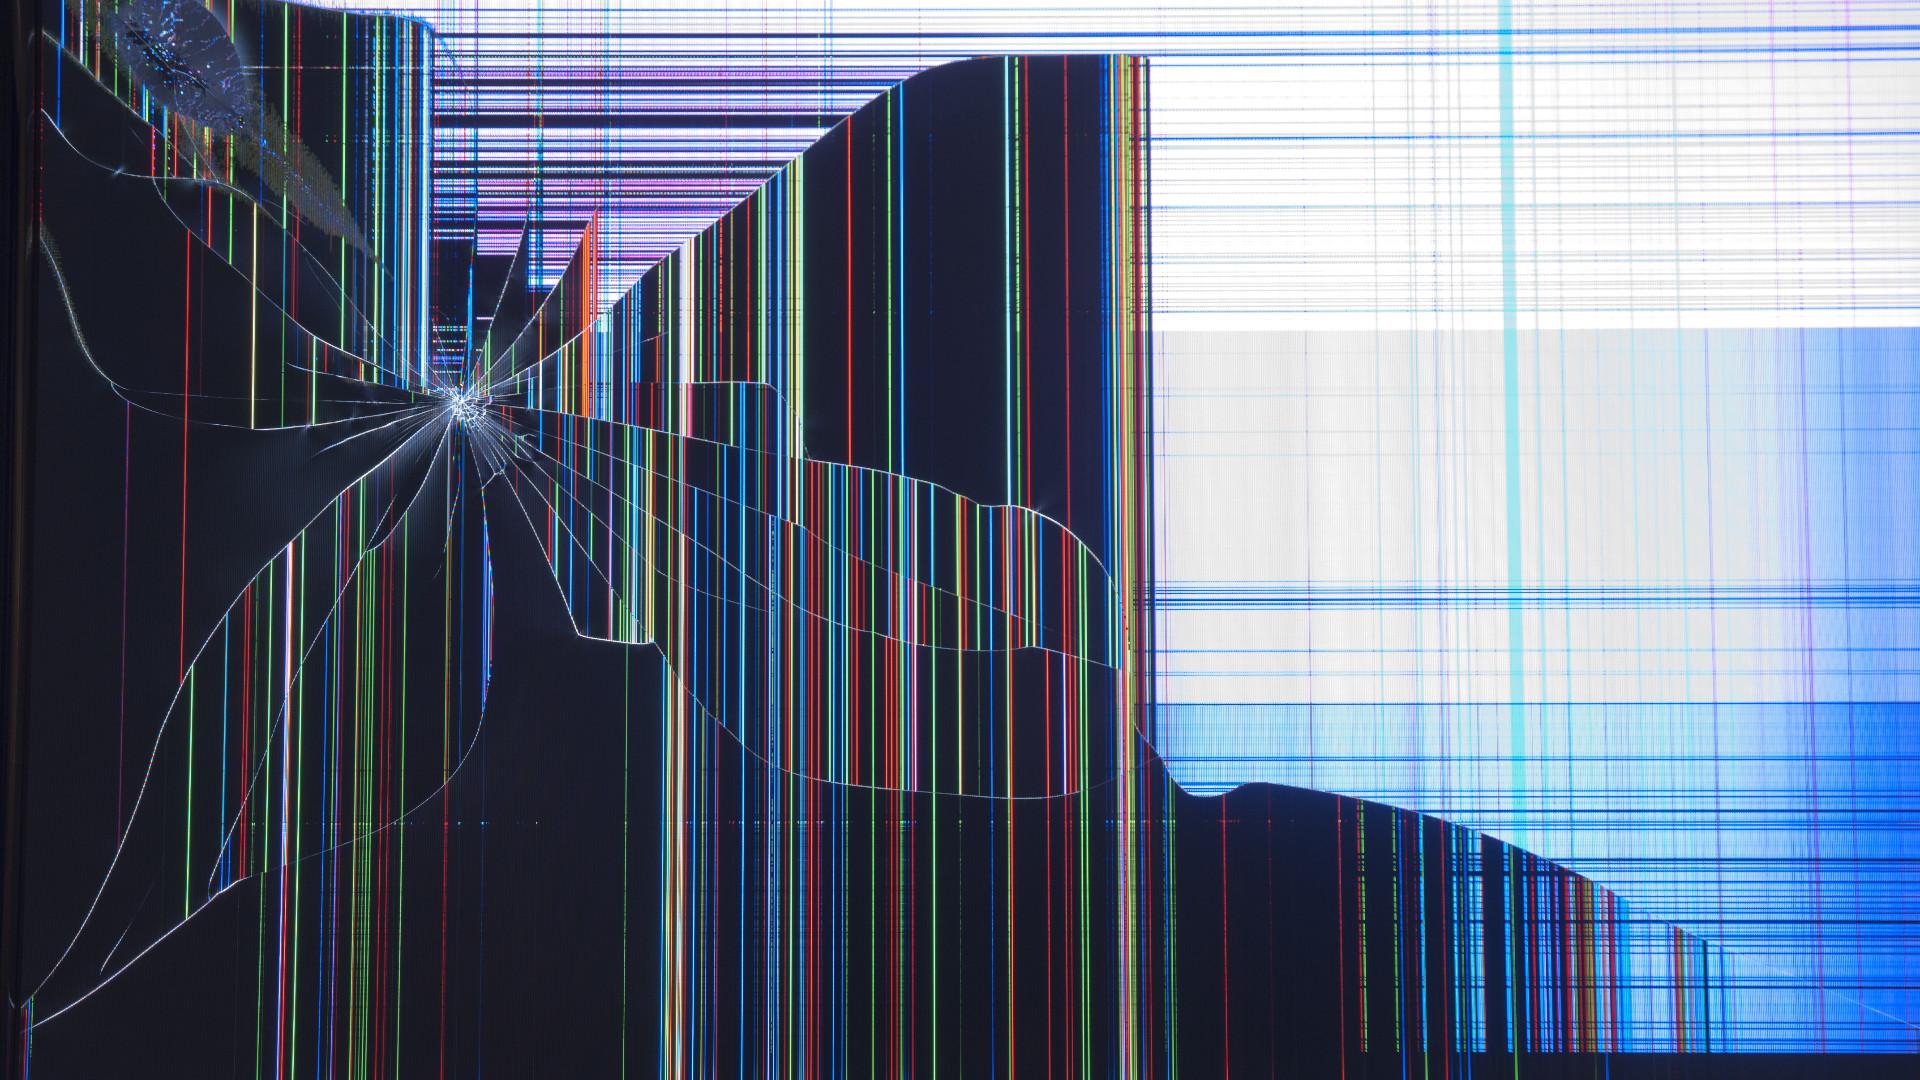 Broken Laptop Screen Wallpaper: Broken Lcd Screen Wallpaper (62+ Images